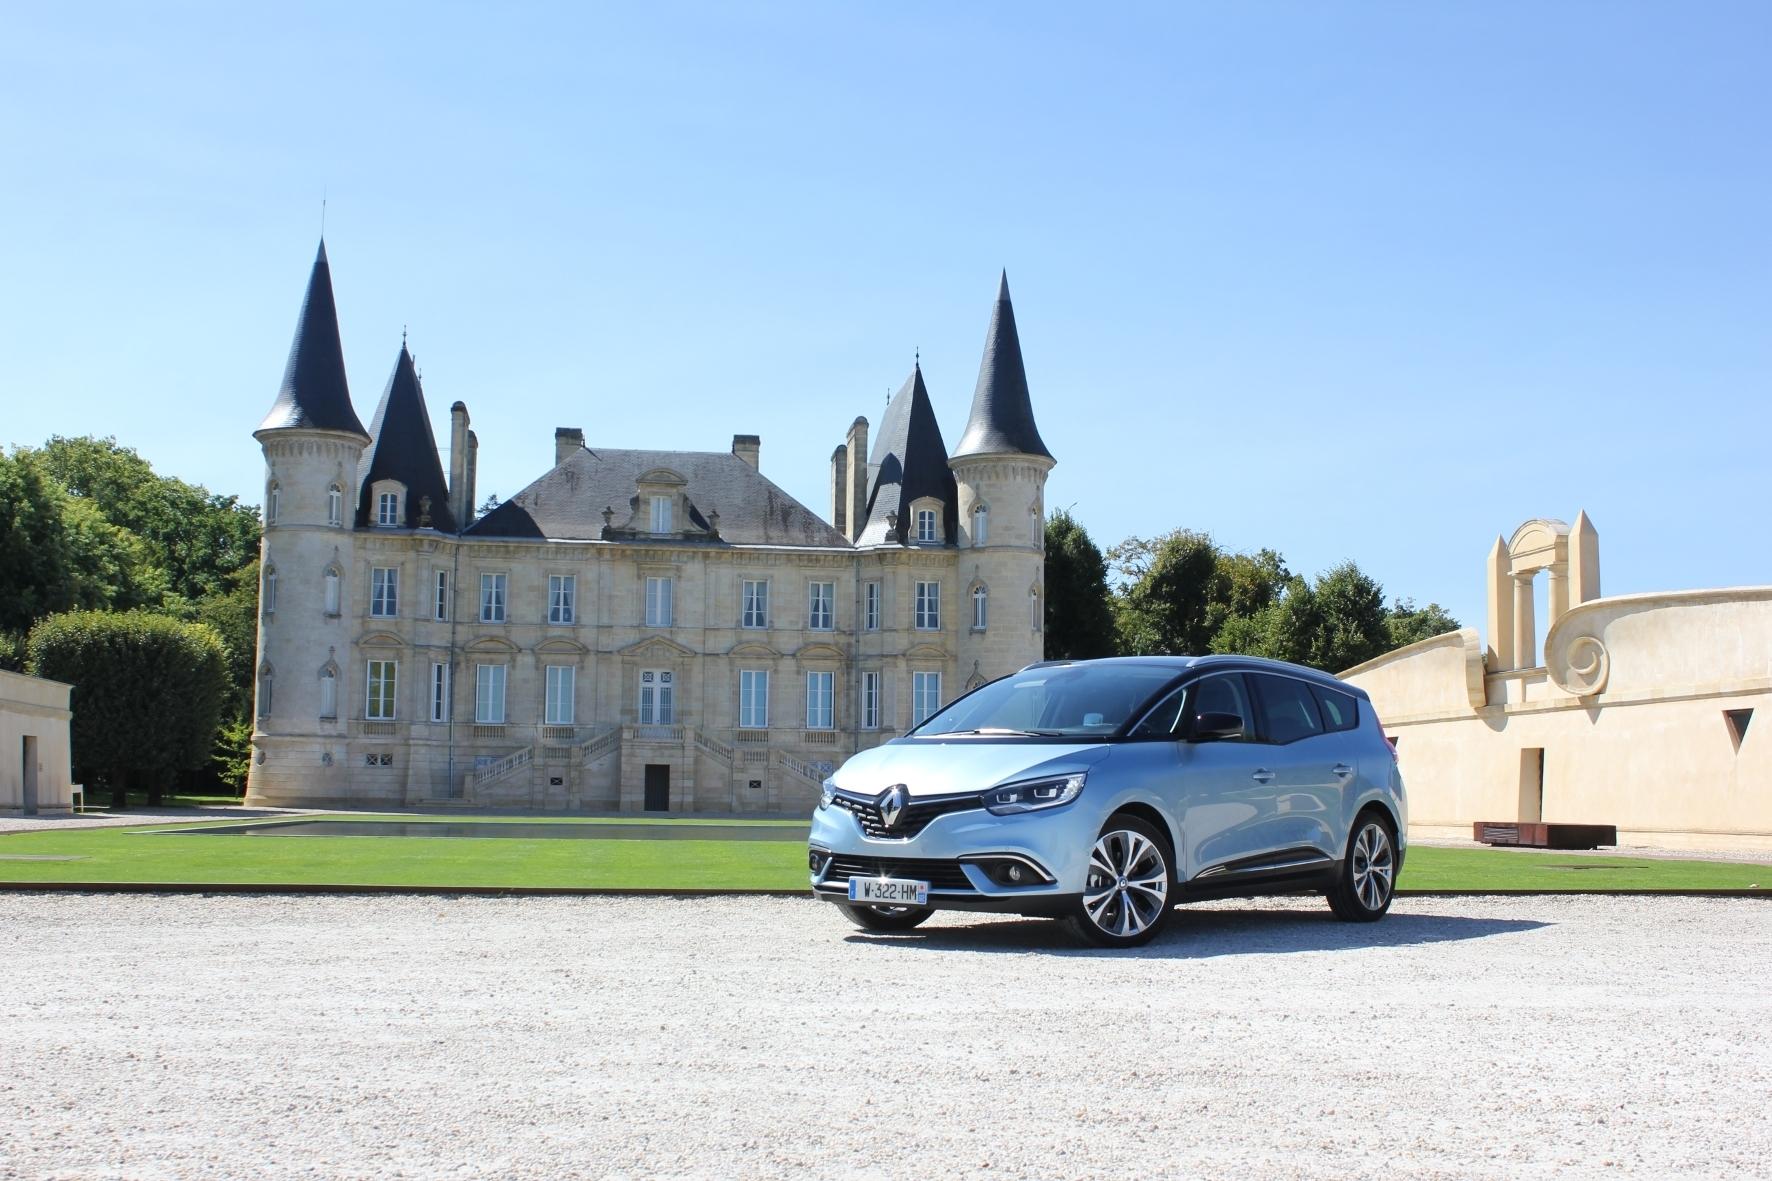 mid Bordeaux - Avantgarde auf Rädern: der neue Renault Grand Scenic.